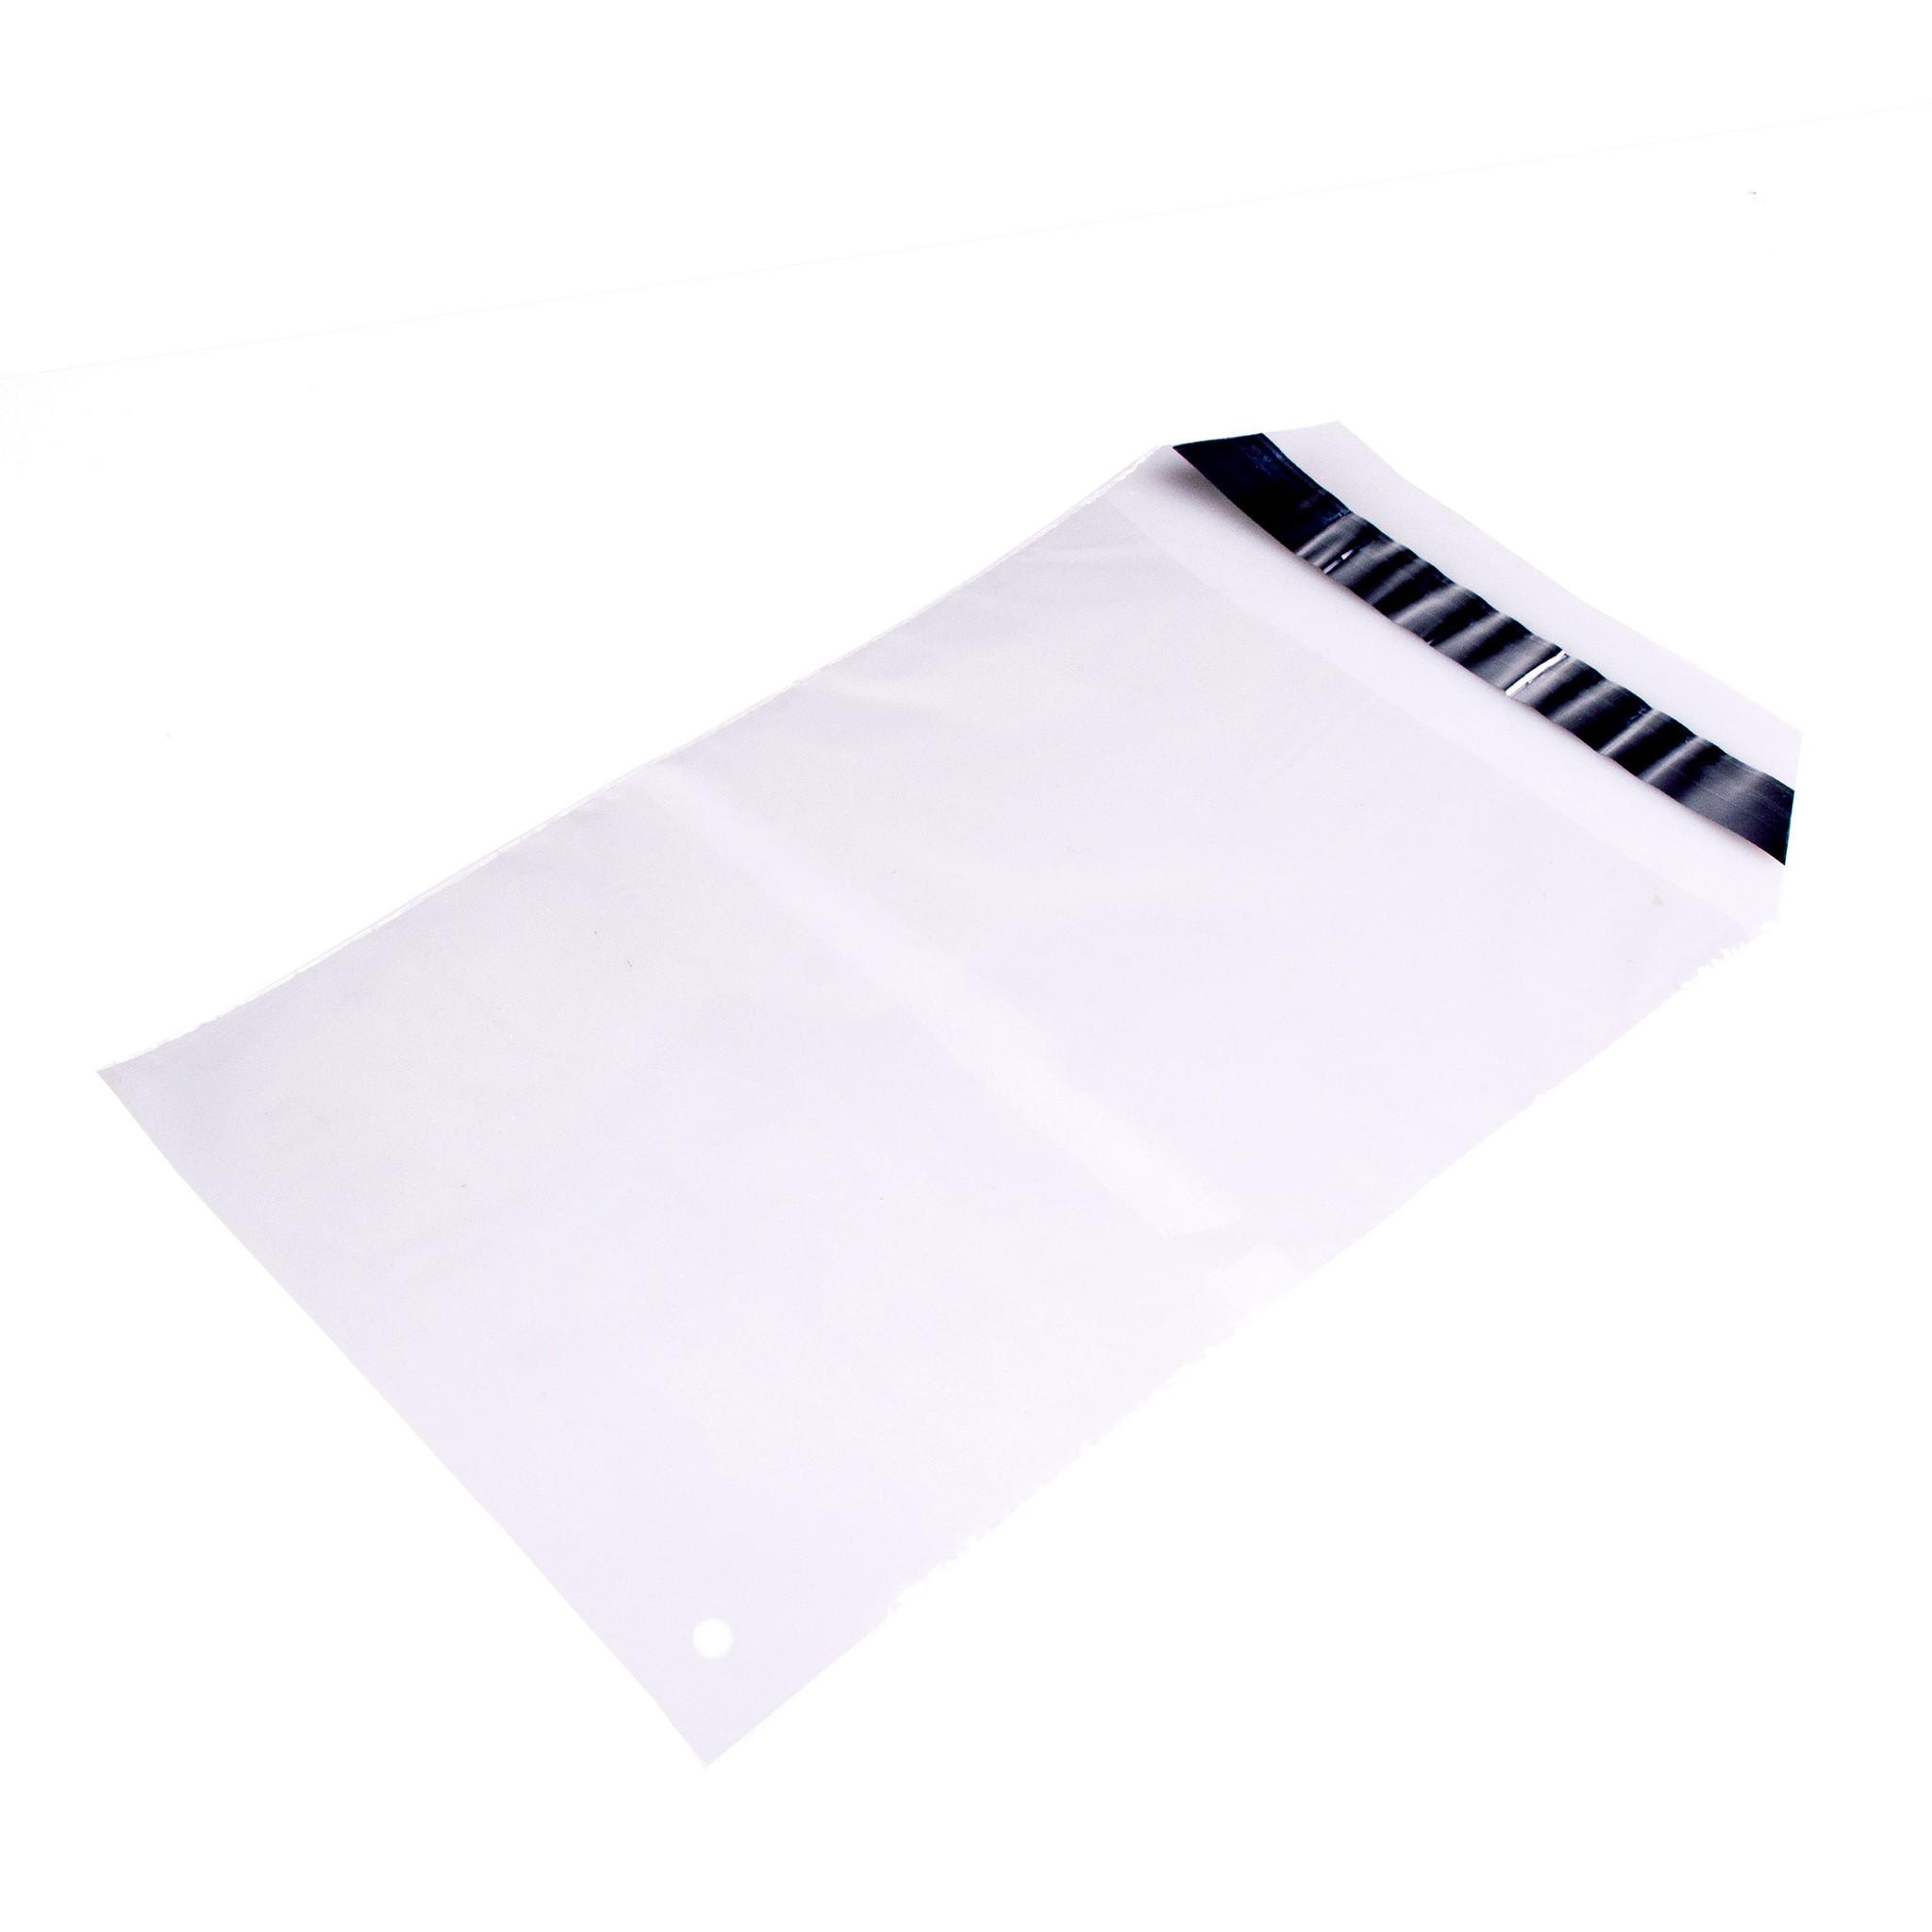 Mailing envelop 225 x 305 + 50 mm uit 45 micron LDPE pakje van 100 stuks